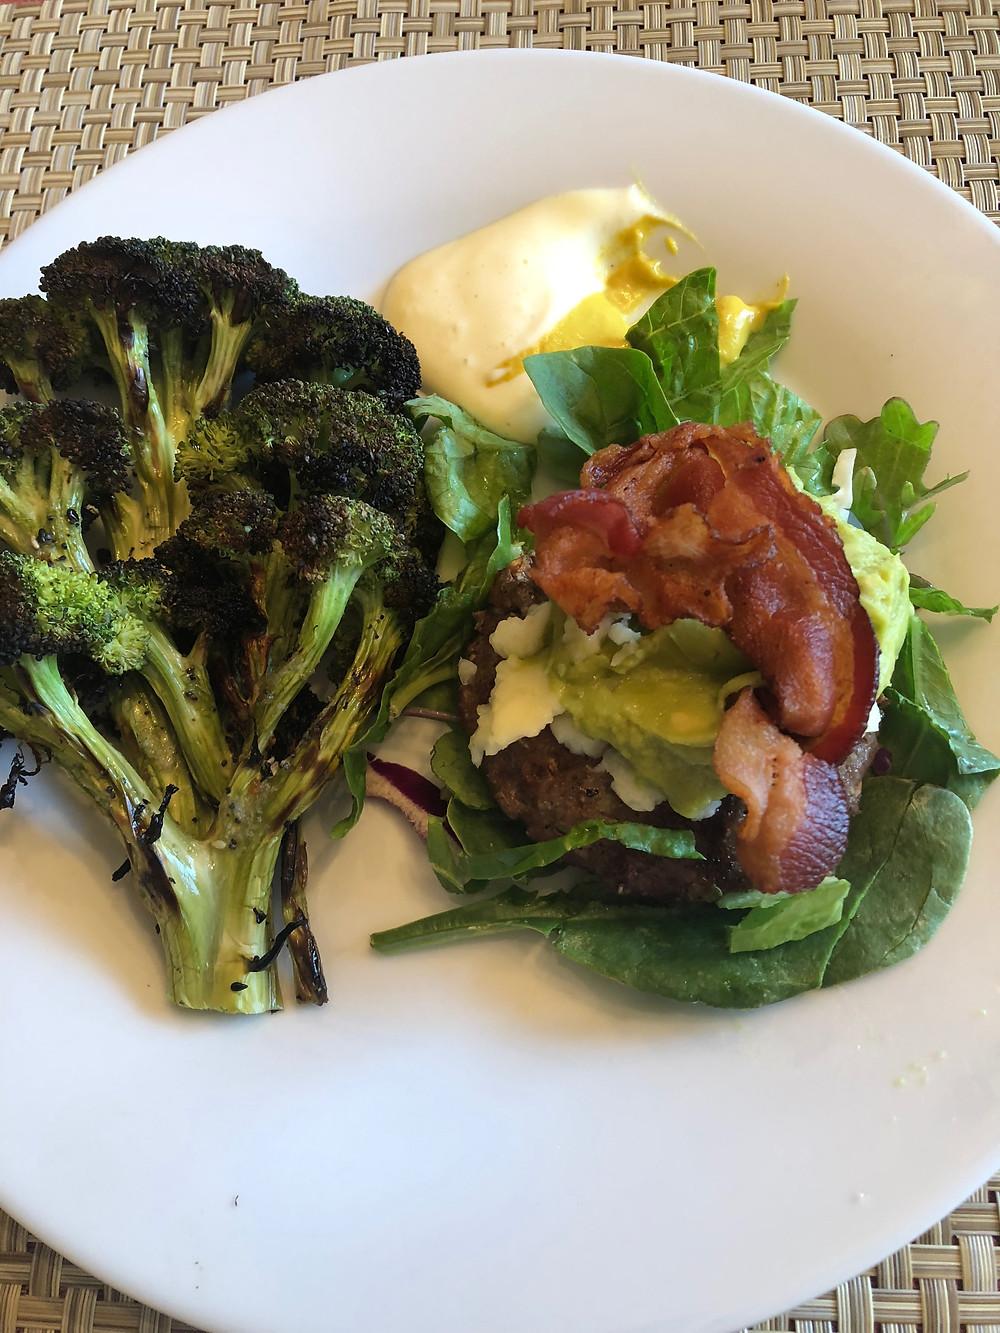 keto low carb hamburger bacon grilled broccoli mayonnaise avocado healthy grain free